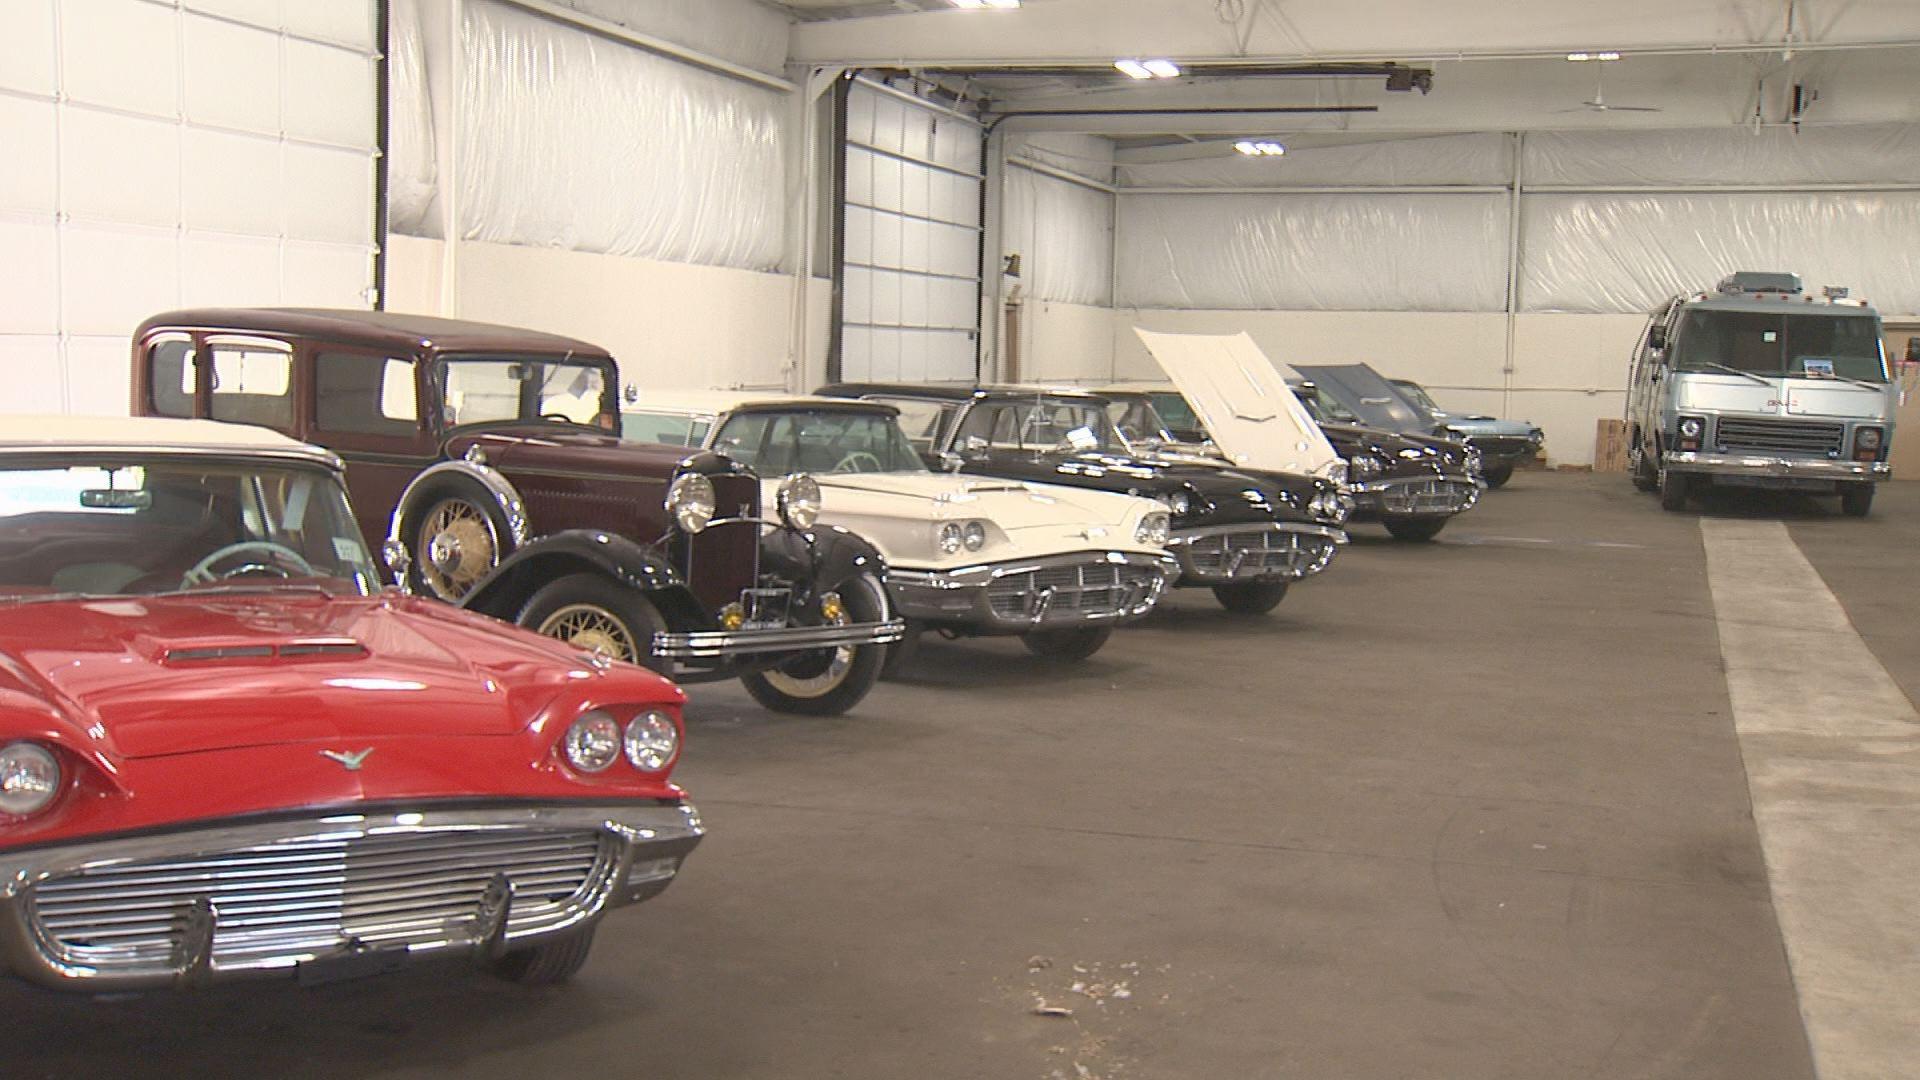 kgw.com   More than 50 classic cars found hidden inside Michigan barn